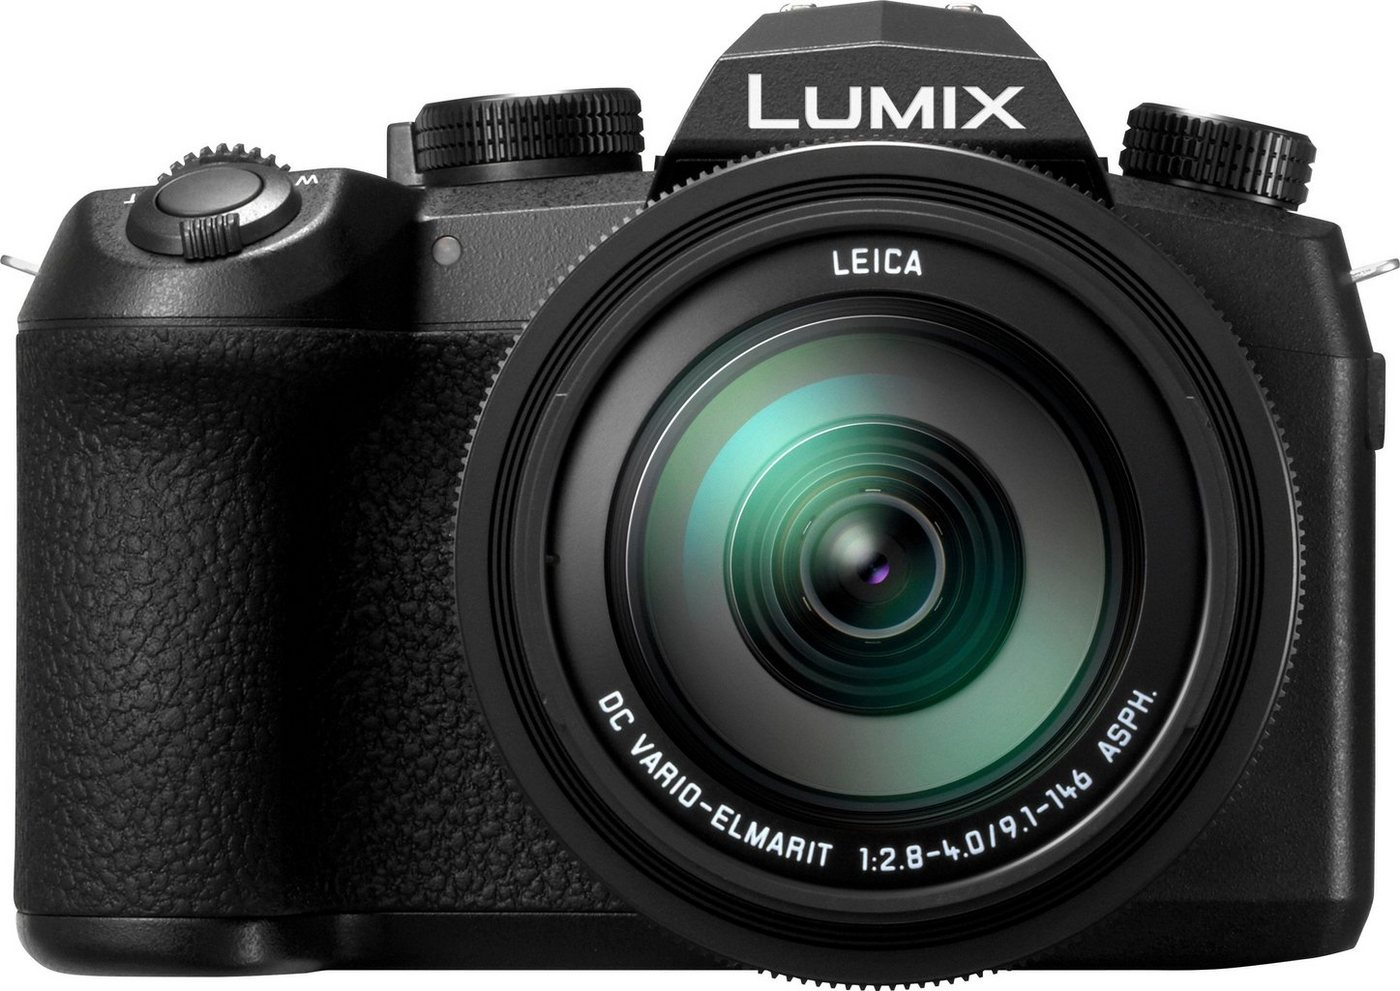 Digitalkameras - Panasonic »Premium Bridge LUMIX DC DC FZ10002EG« Superzoom Kamera (LEICA DC VARIO ELMARIT F2.8 4 25 400mm, 20,1 MP, 16x opt. Zoom, WLAN (Wi Fi), Bluetooth)  - Onlineshop OTTO